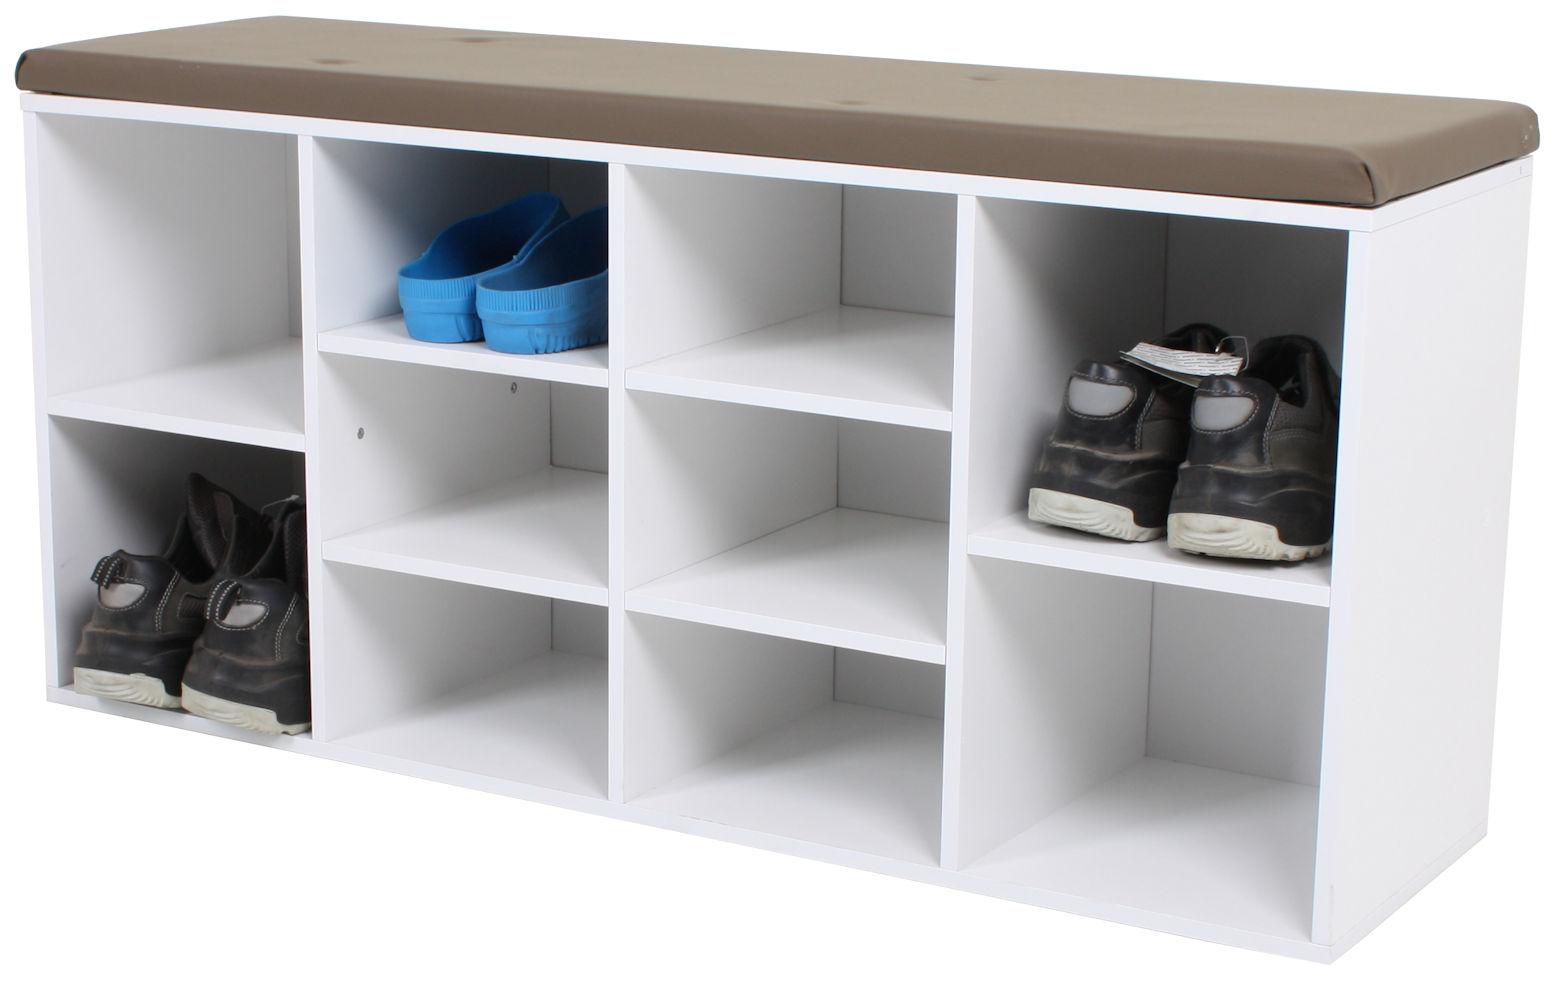 holz schuhbank 103 cm 10 f cher schuhregal sitzbank schuhschrank schuhablage 4260461475588. Black Bedroom Furniture Sets. Home Design Ideas